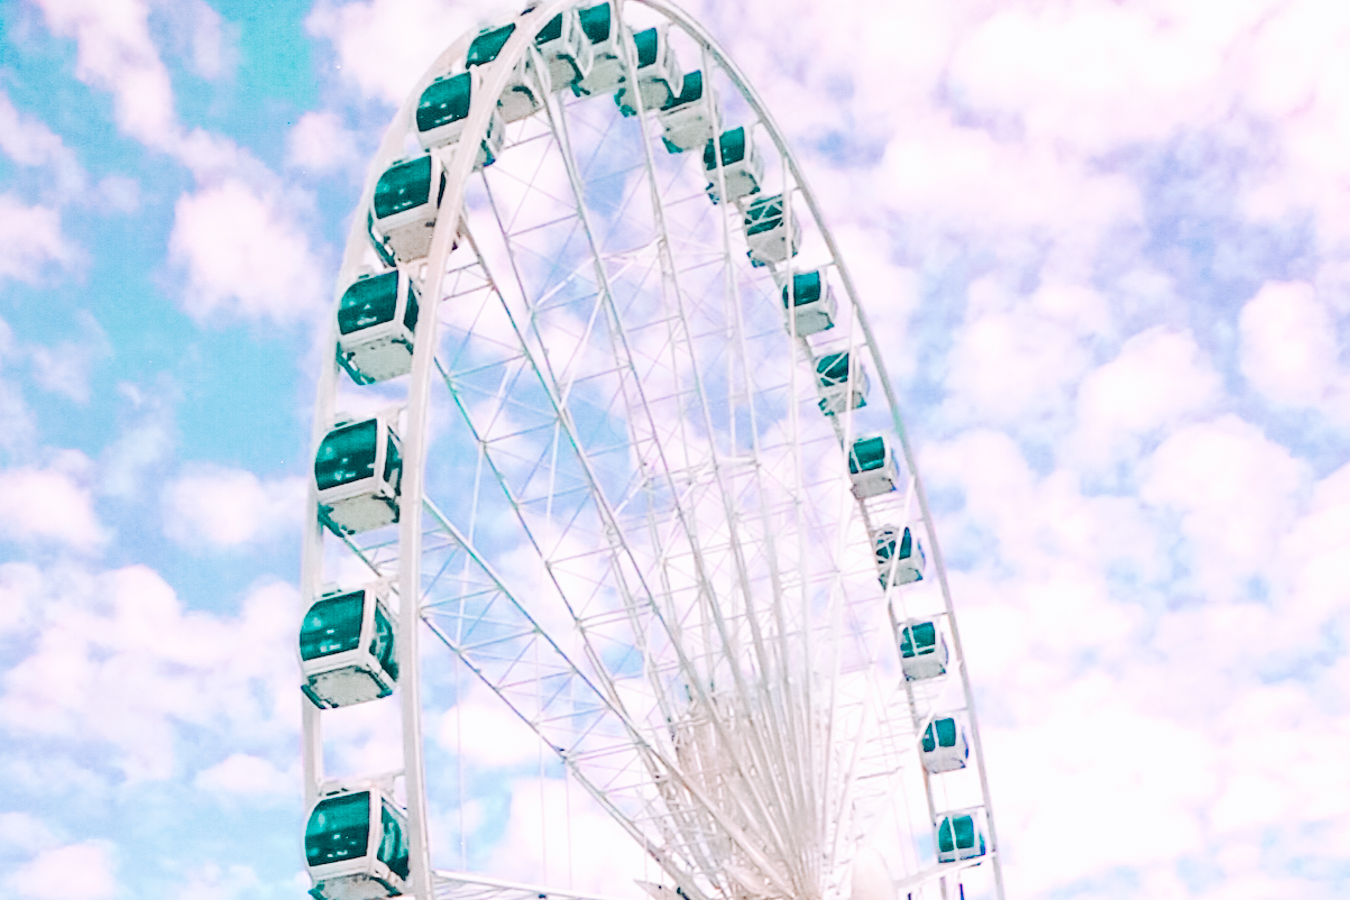 Ferris wheel and a blue sky